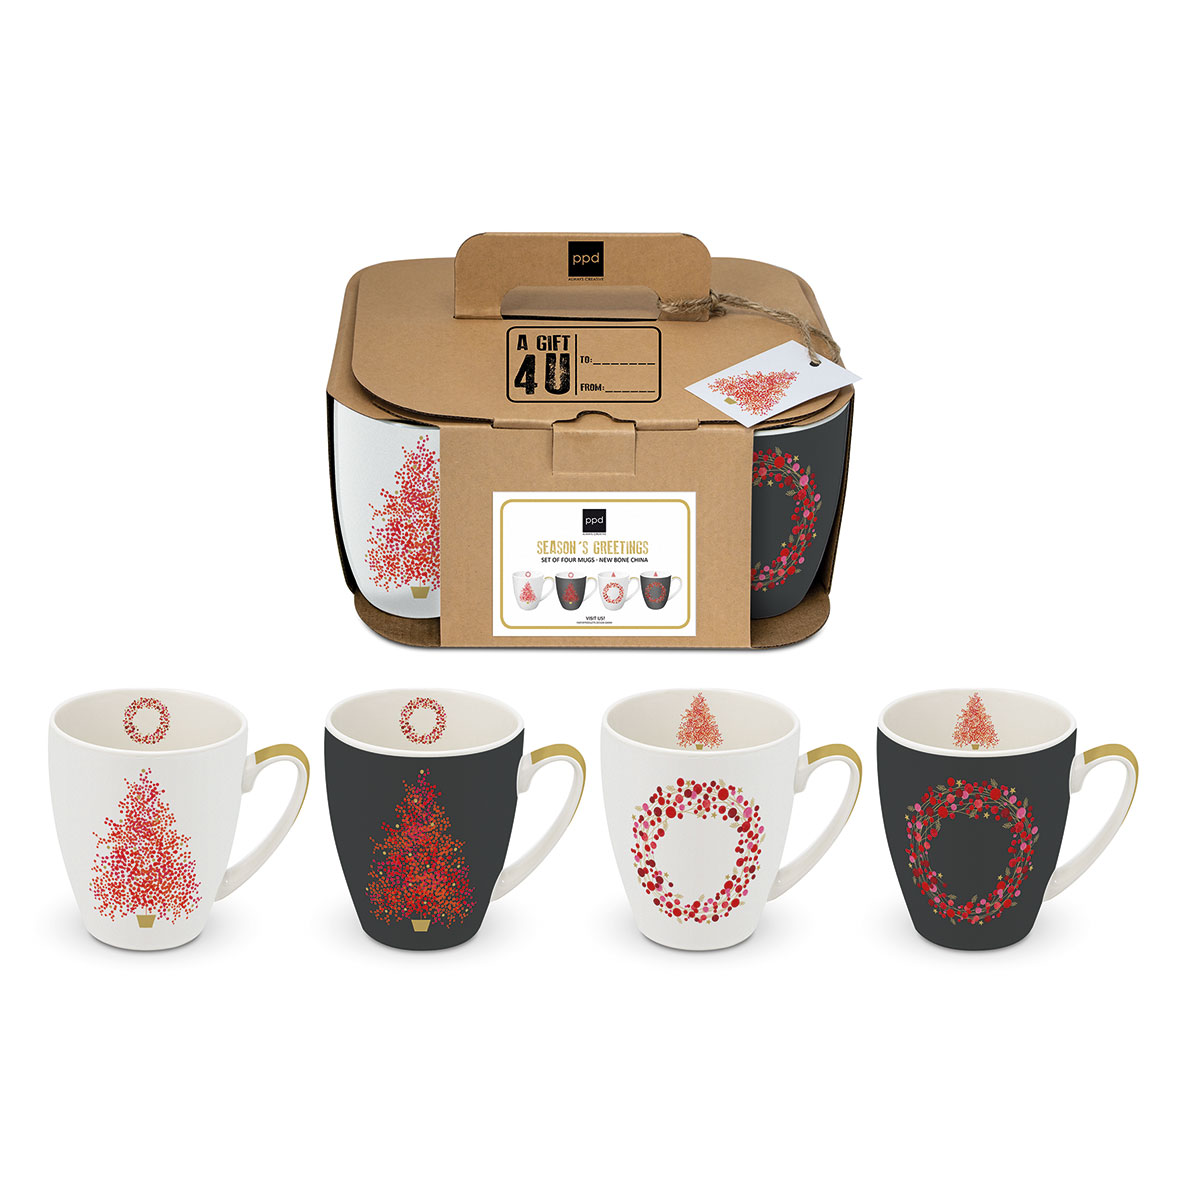 Season´s Greetings 4 Mug Set